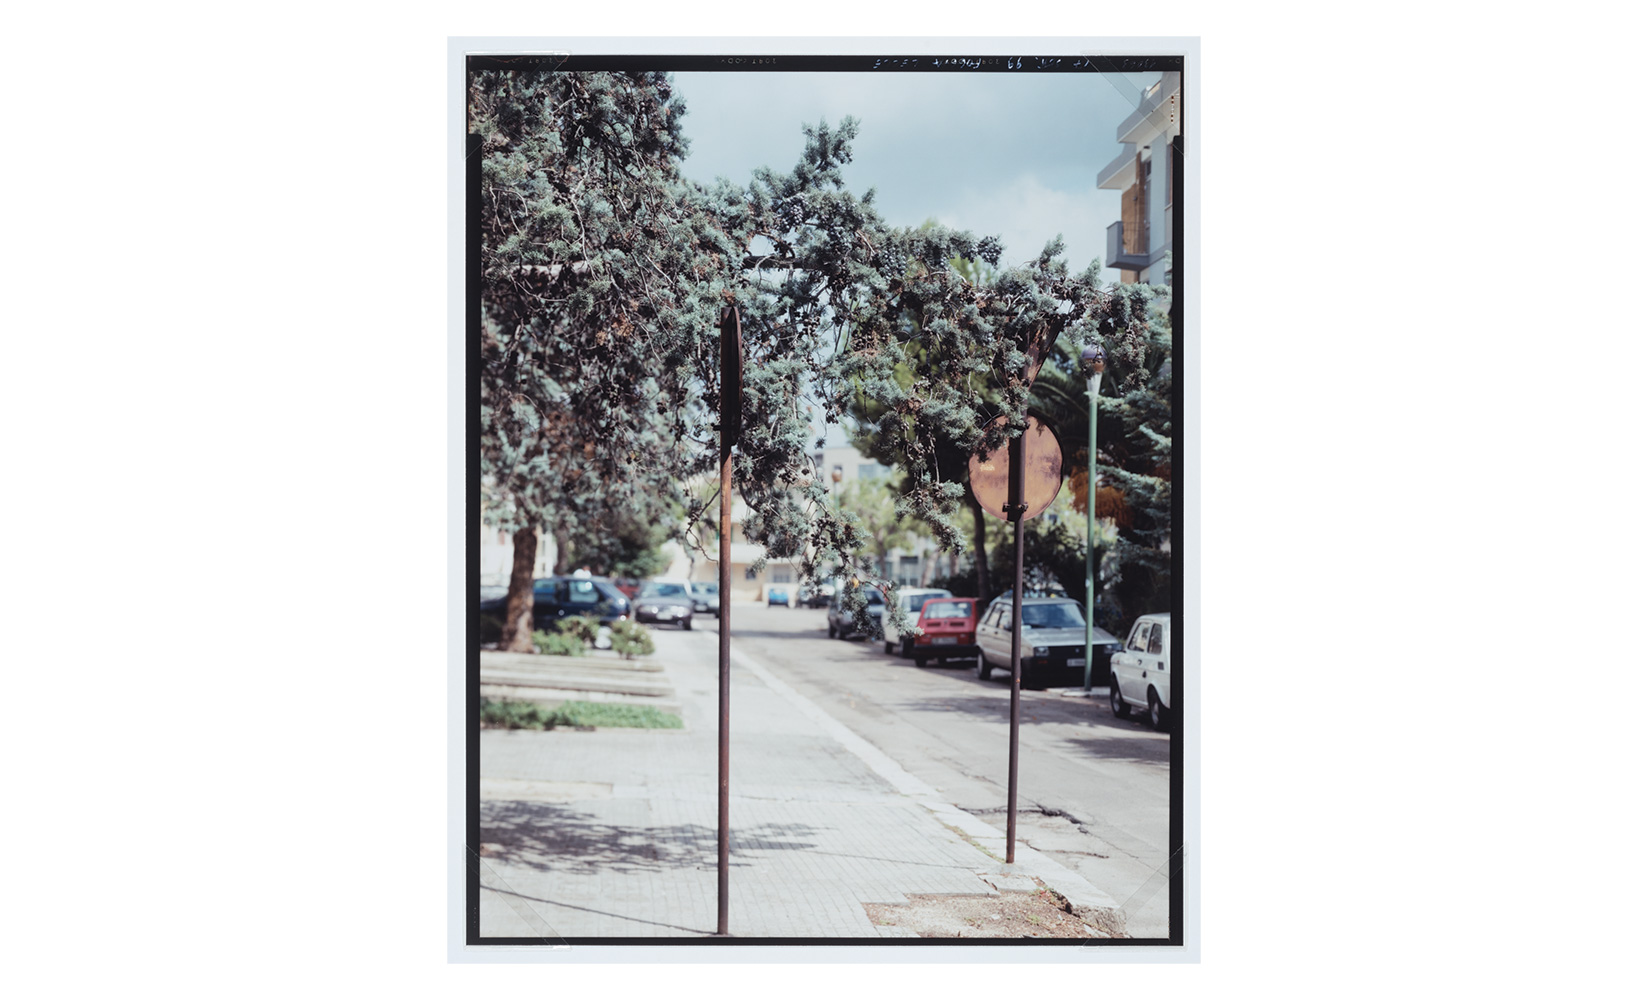 olivier-andreotti-guido-GUIDI-12.jpg